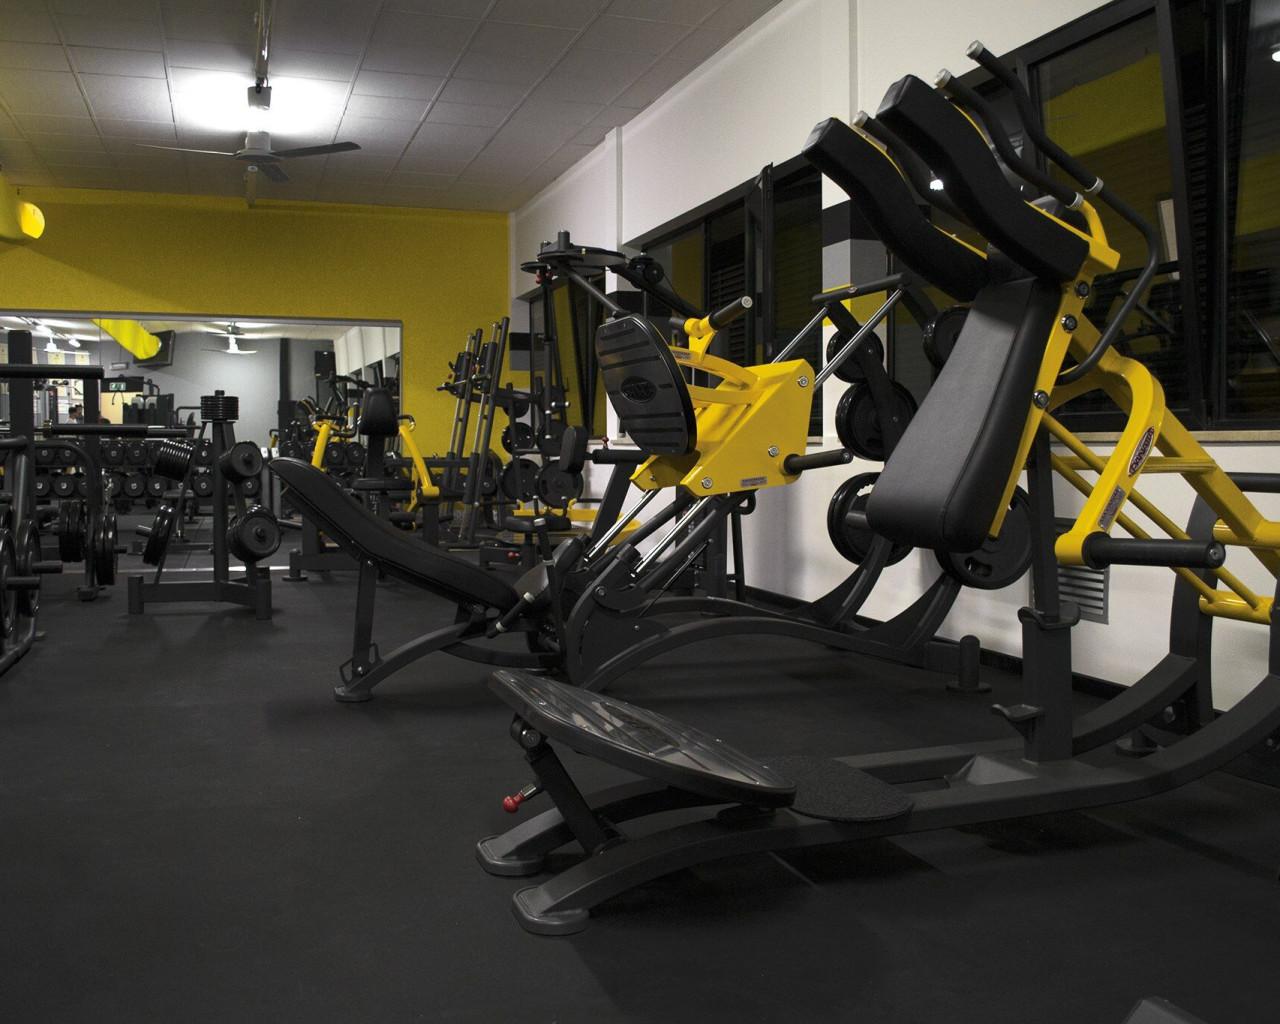 Atlas Gym